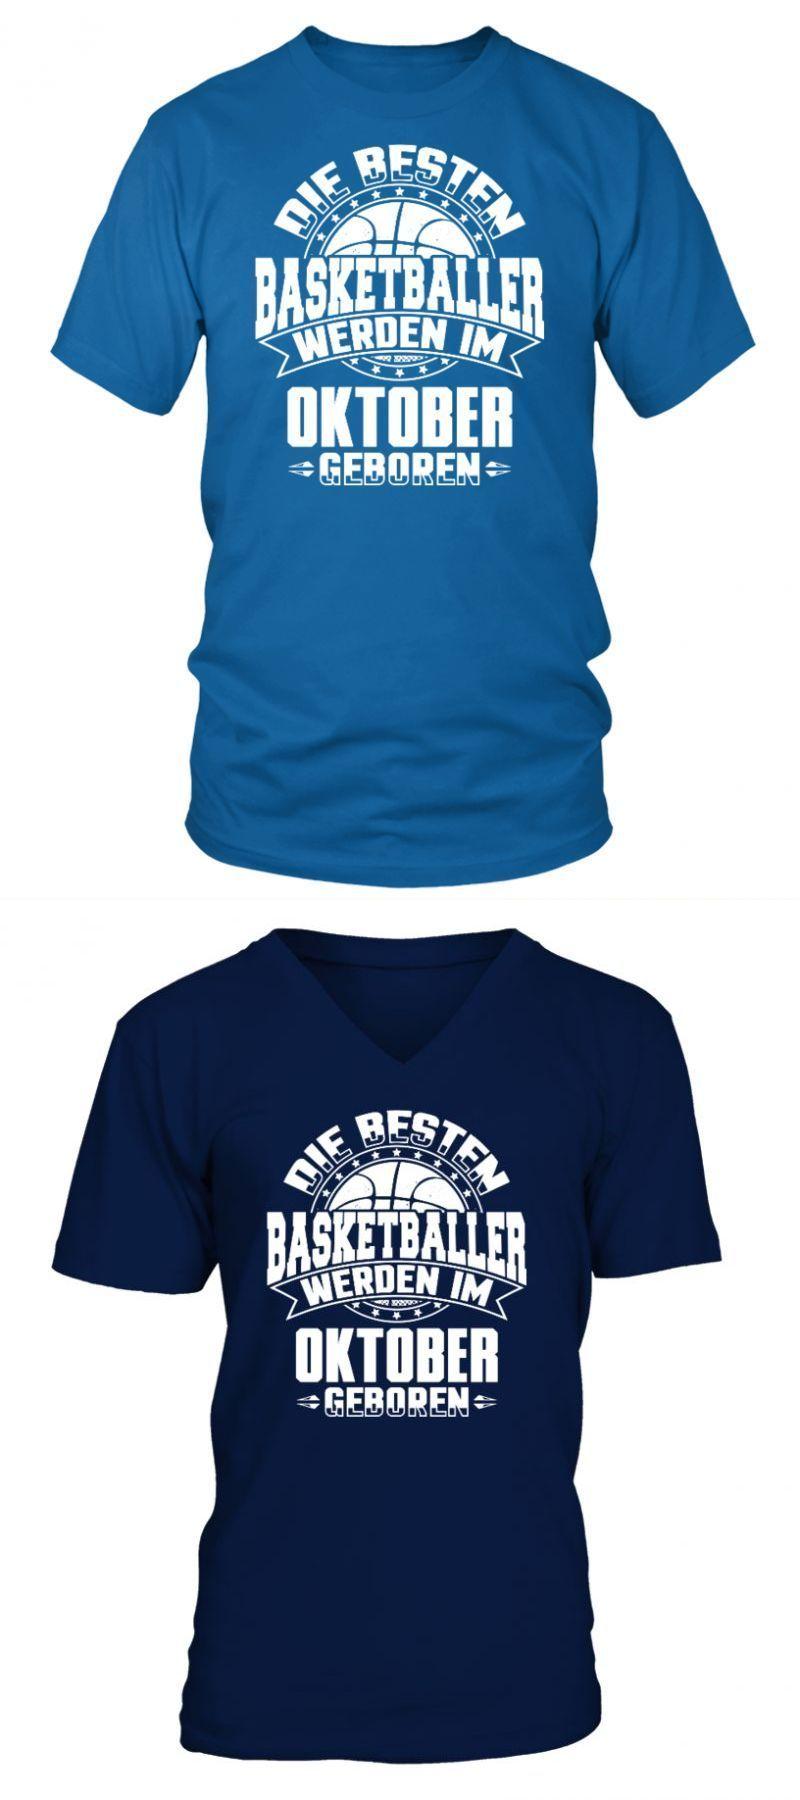 Basketball T Shirt Designs High School Basketball Geburtstag Oktober